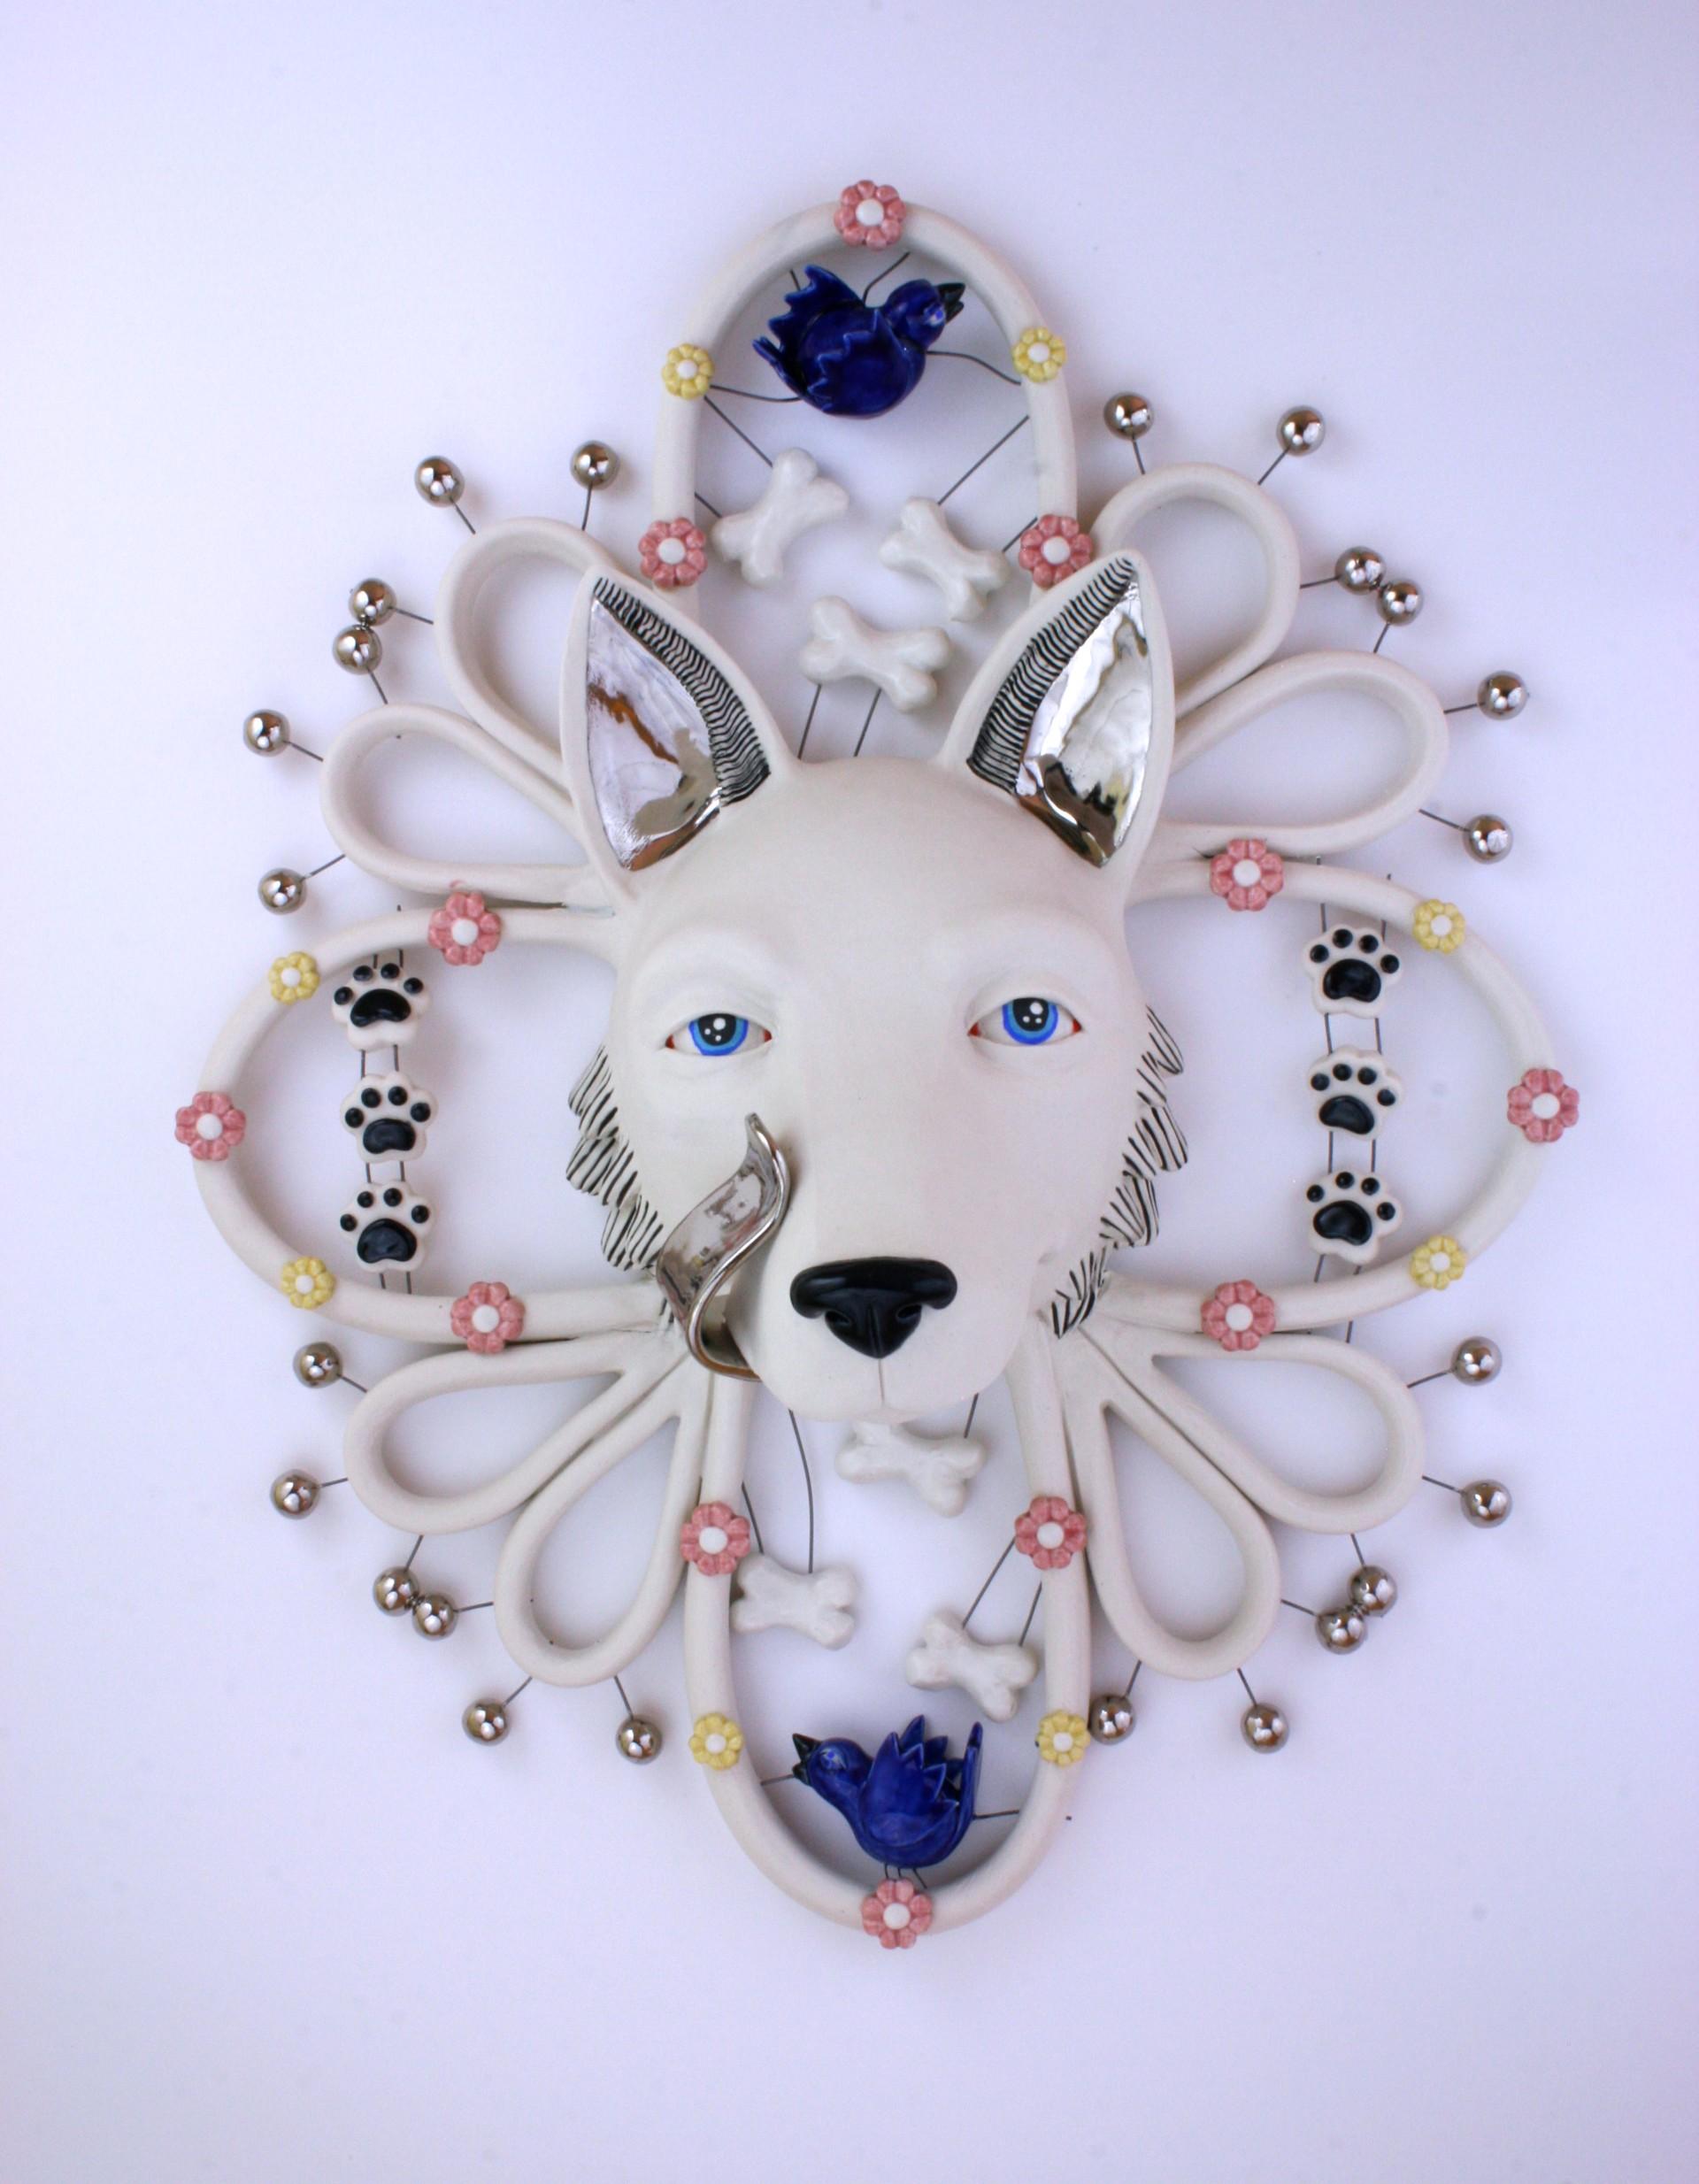 SILVER TONGUE WOLF by Taylor Robenalt